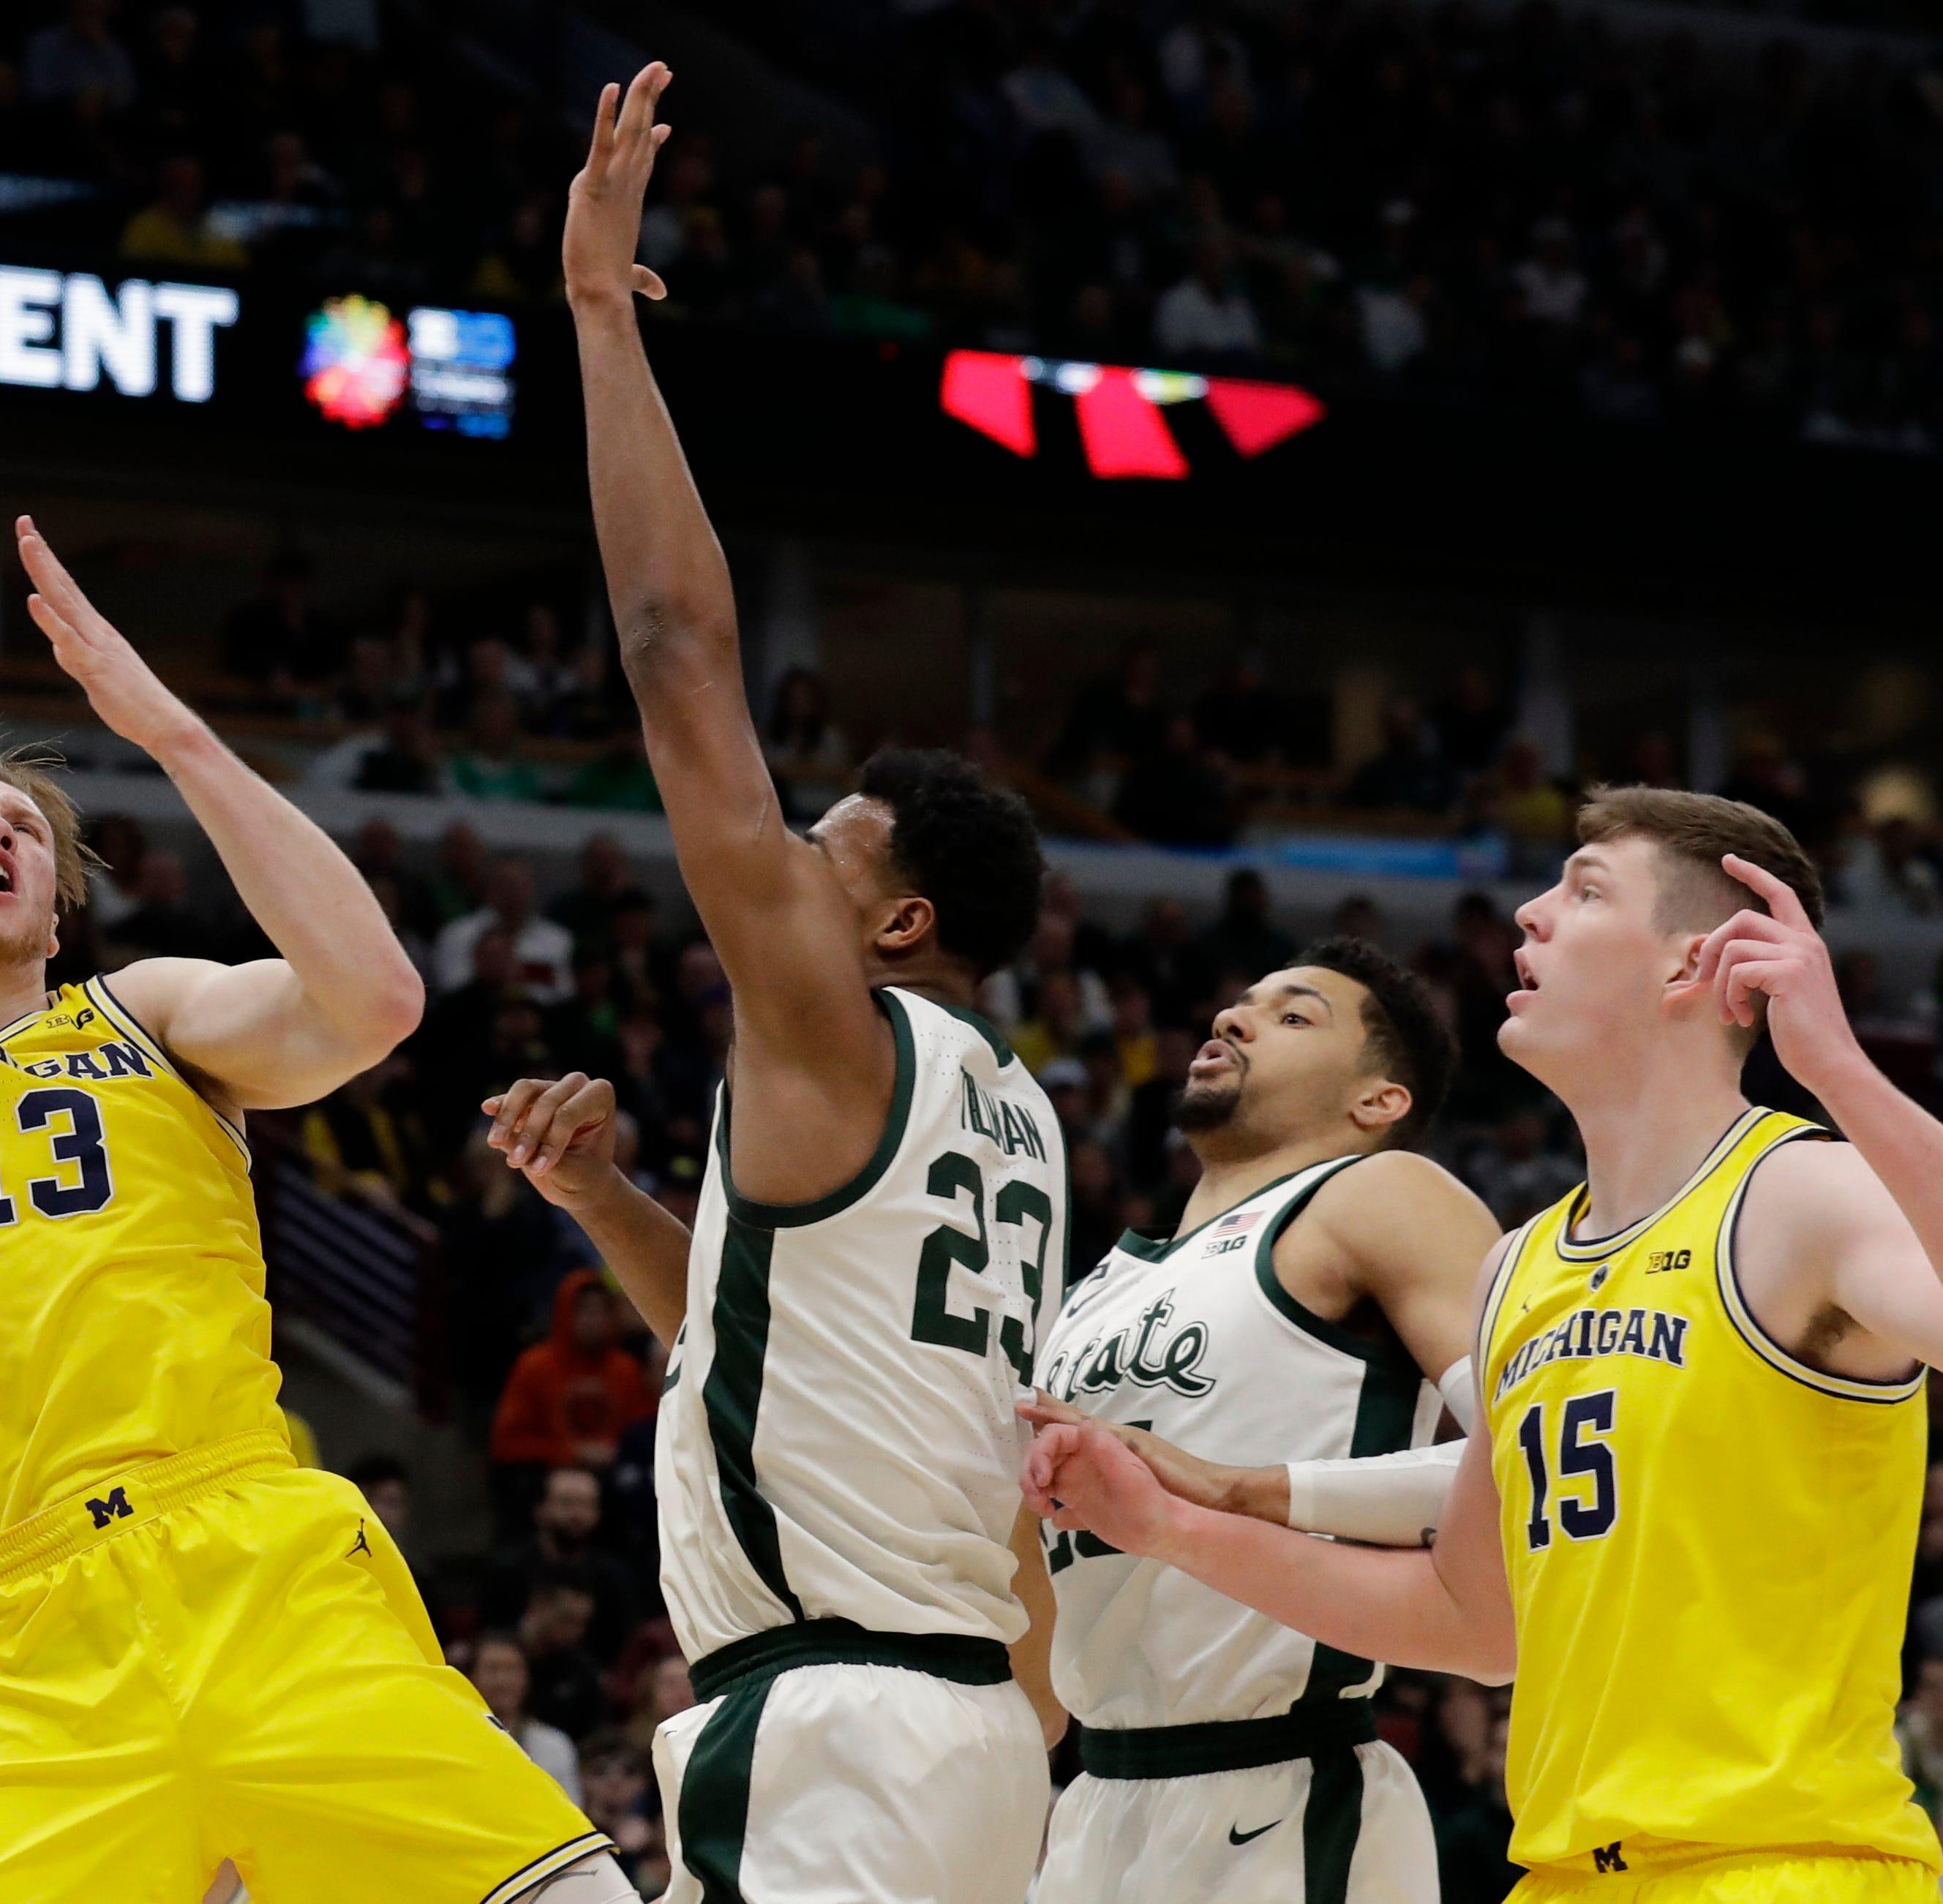 Detroit News predictions: How far Michigan will go in NCAA Tournament